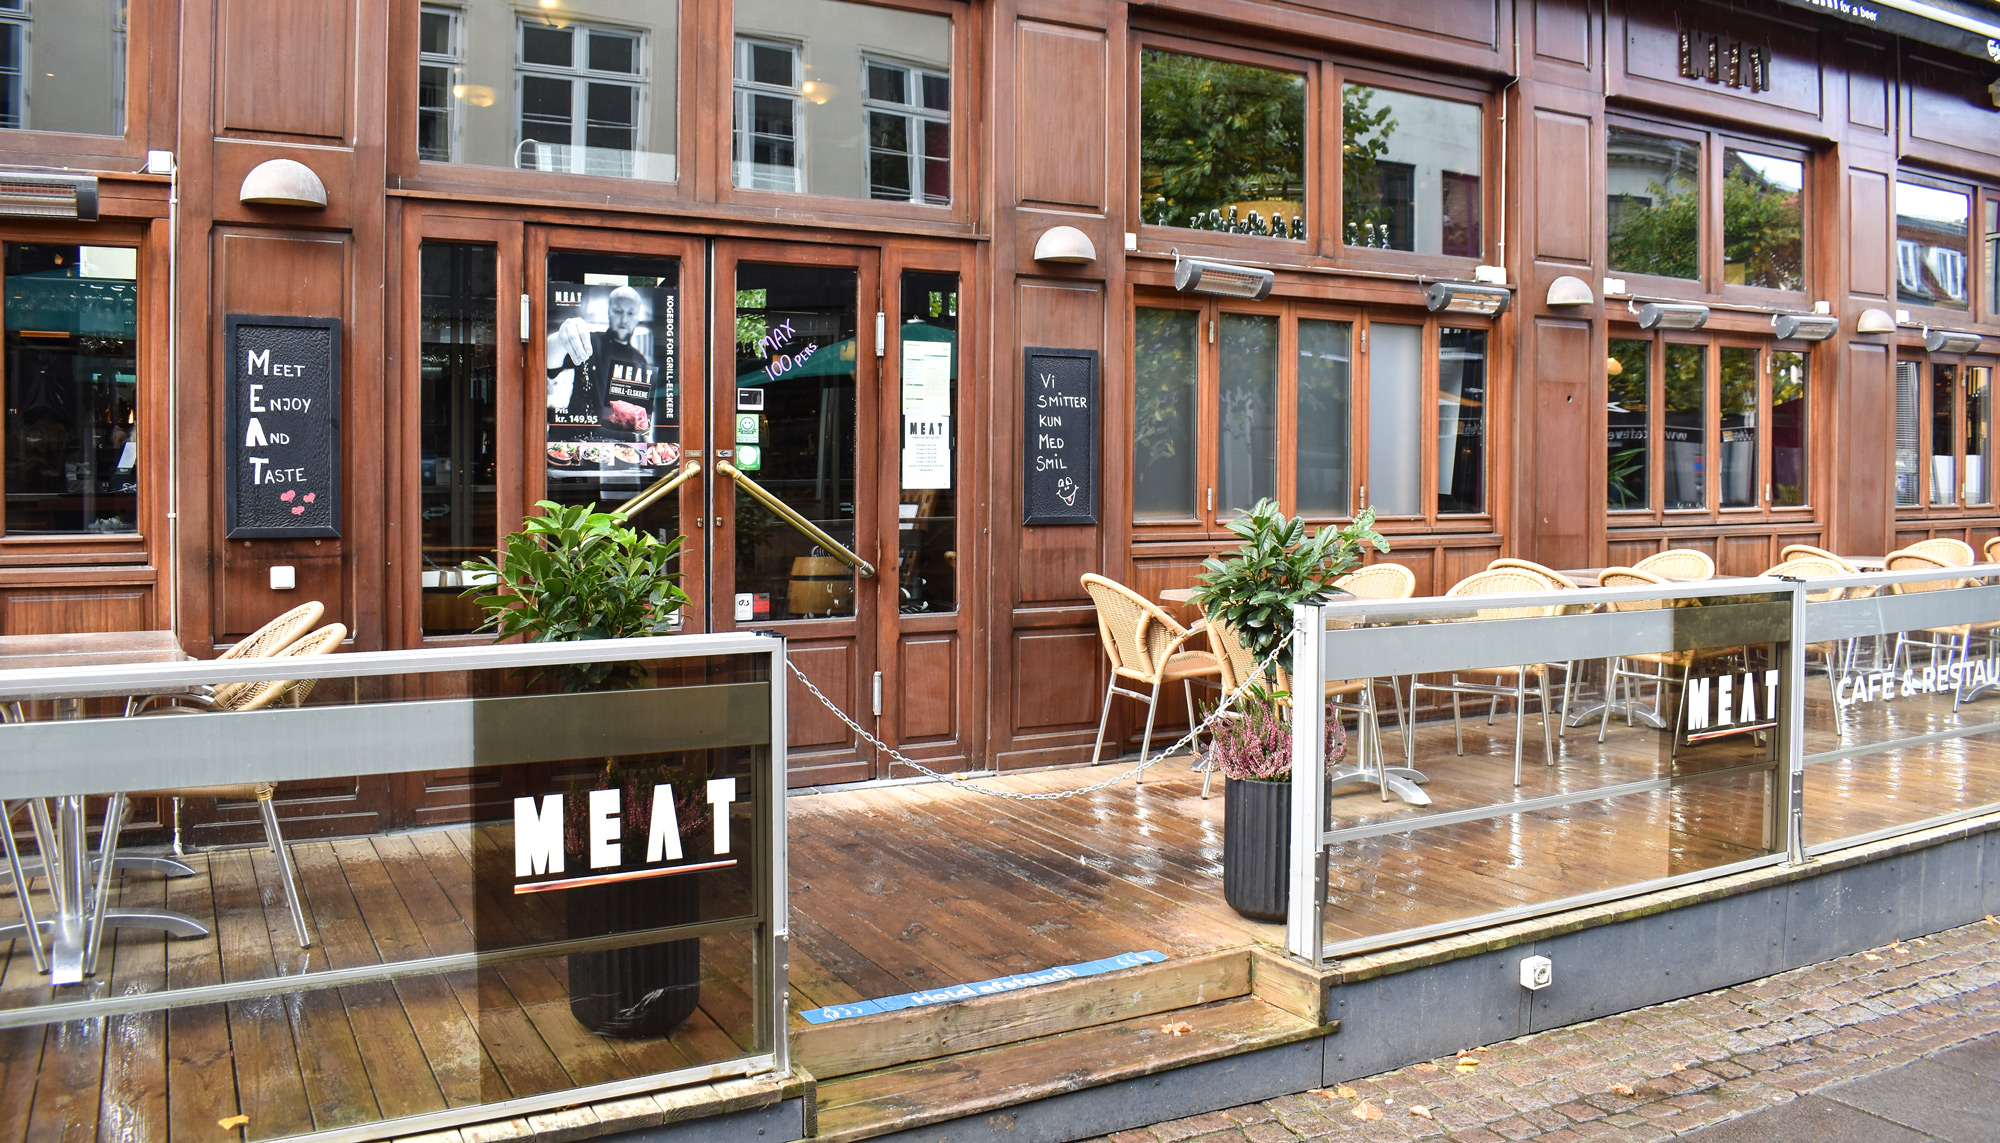 En æra slutter: Aalborg-restaurant slutter med populær brunch